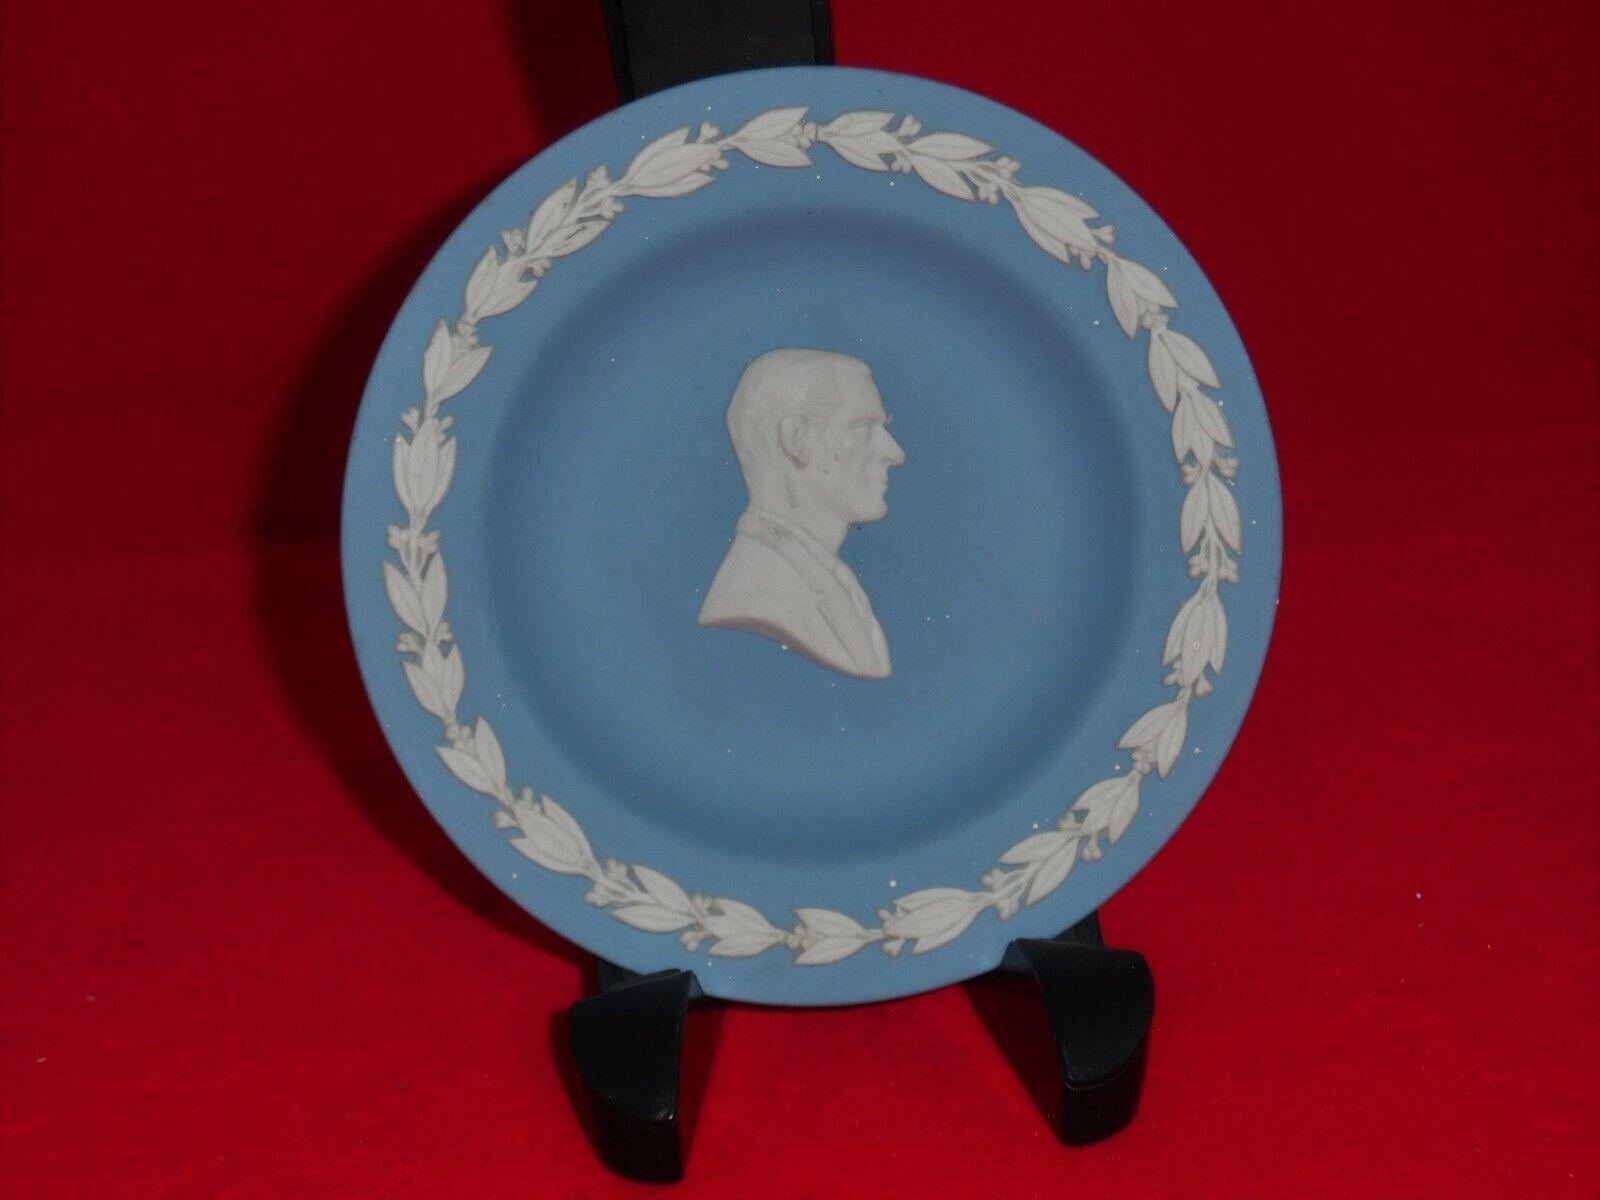 Image 1 - Wedgwood blue jasperware pin / trinket dish Duke of Edinburgh in cameo